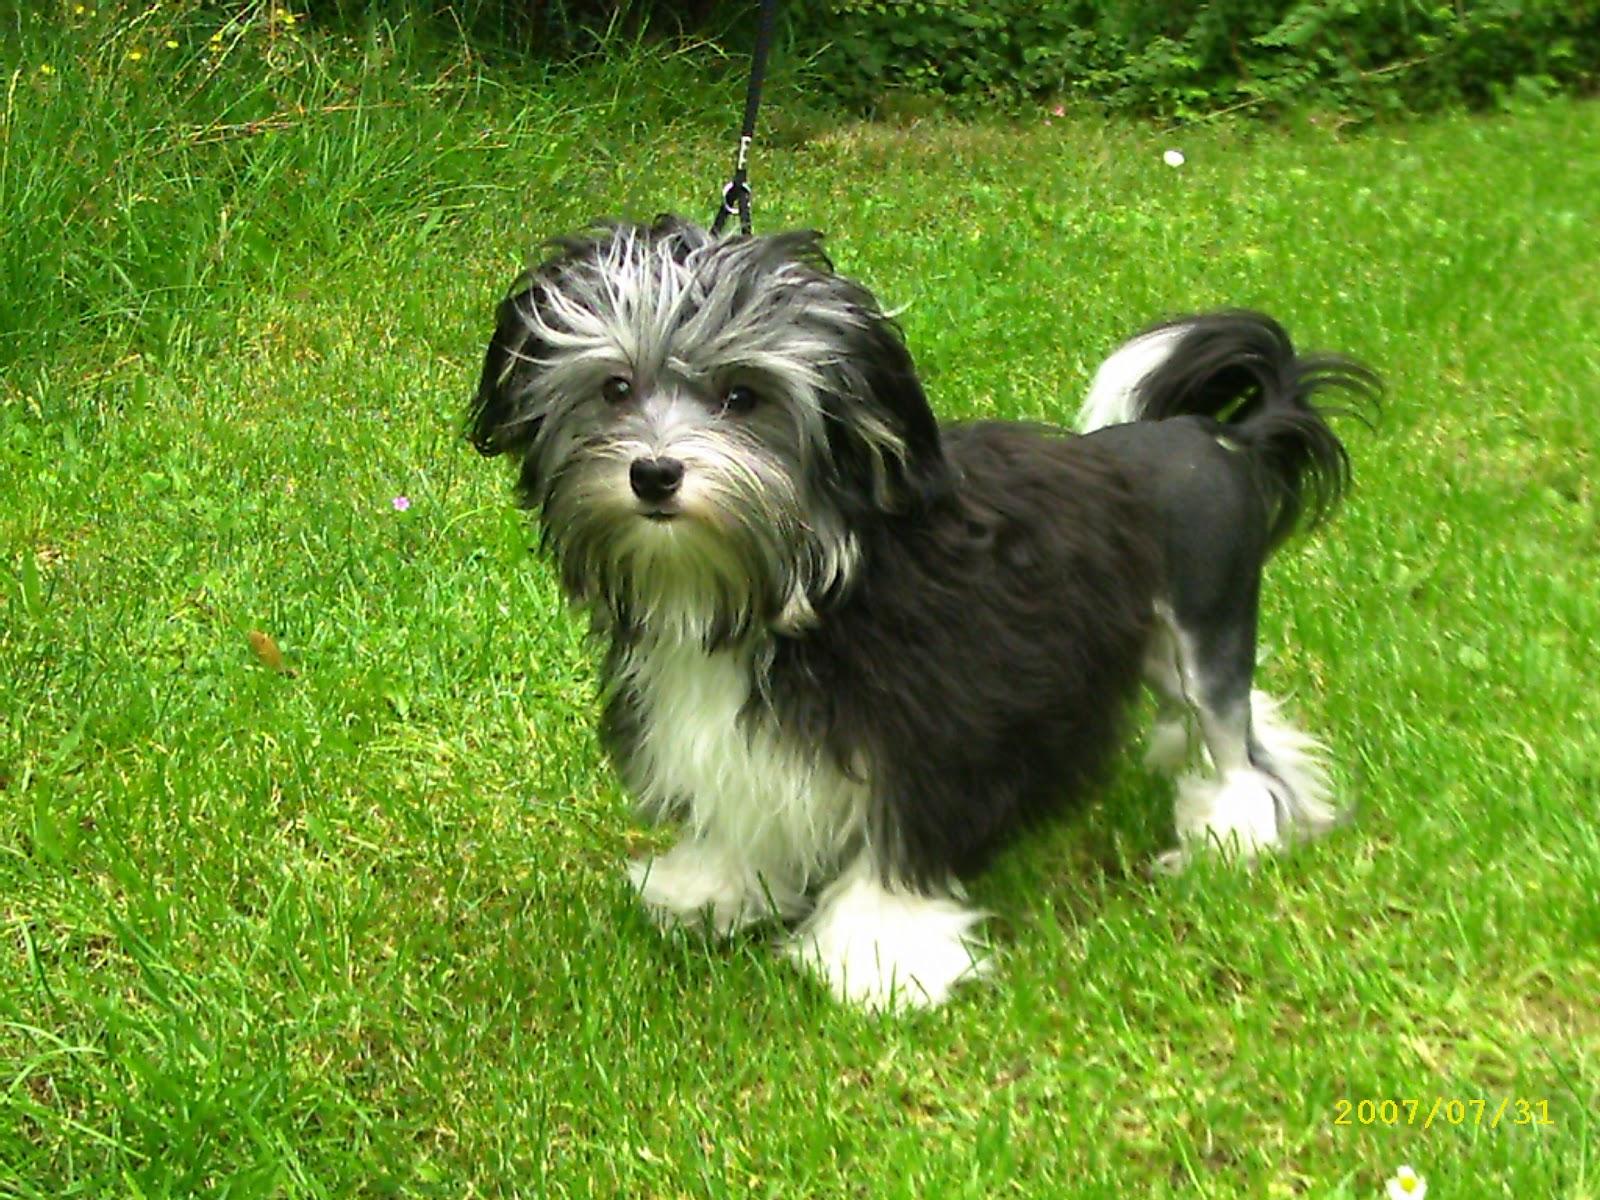 Löwchen dog on the grass wallpaper